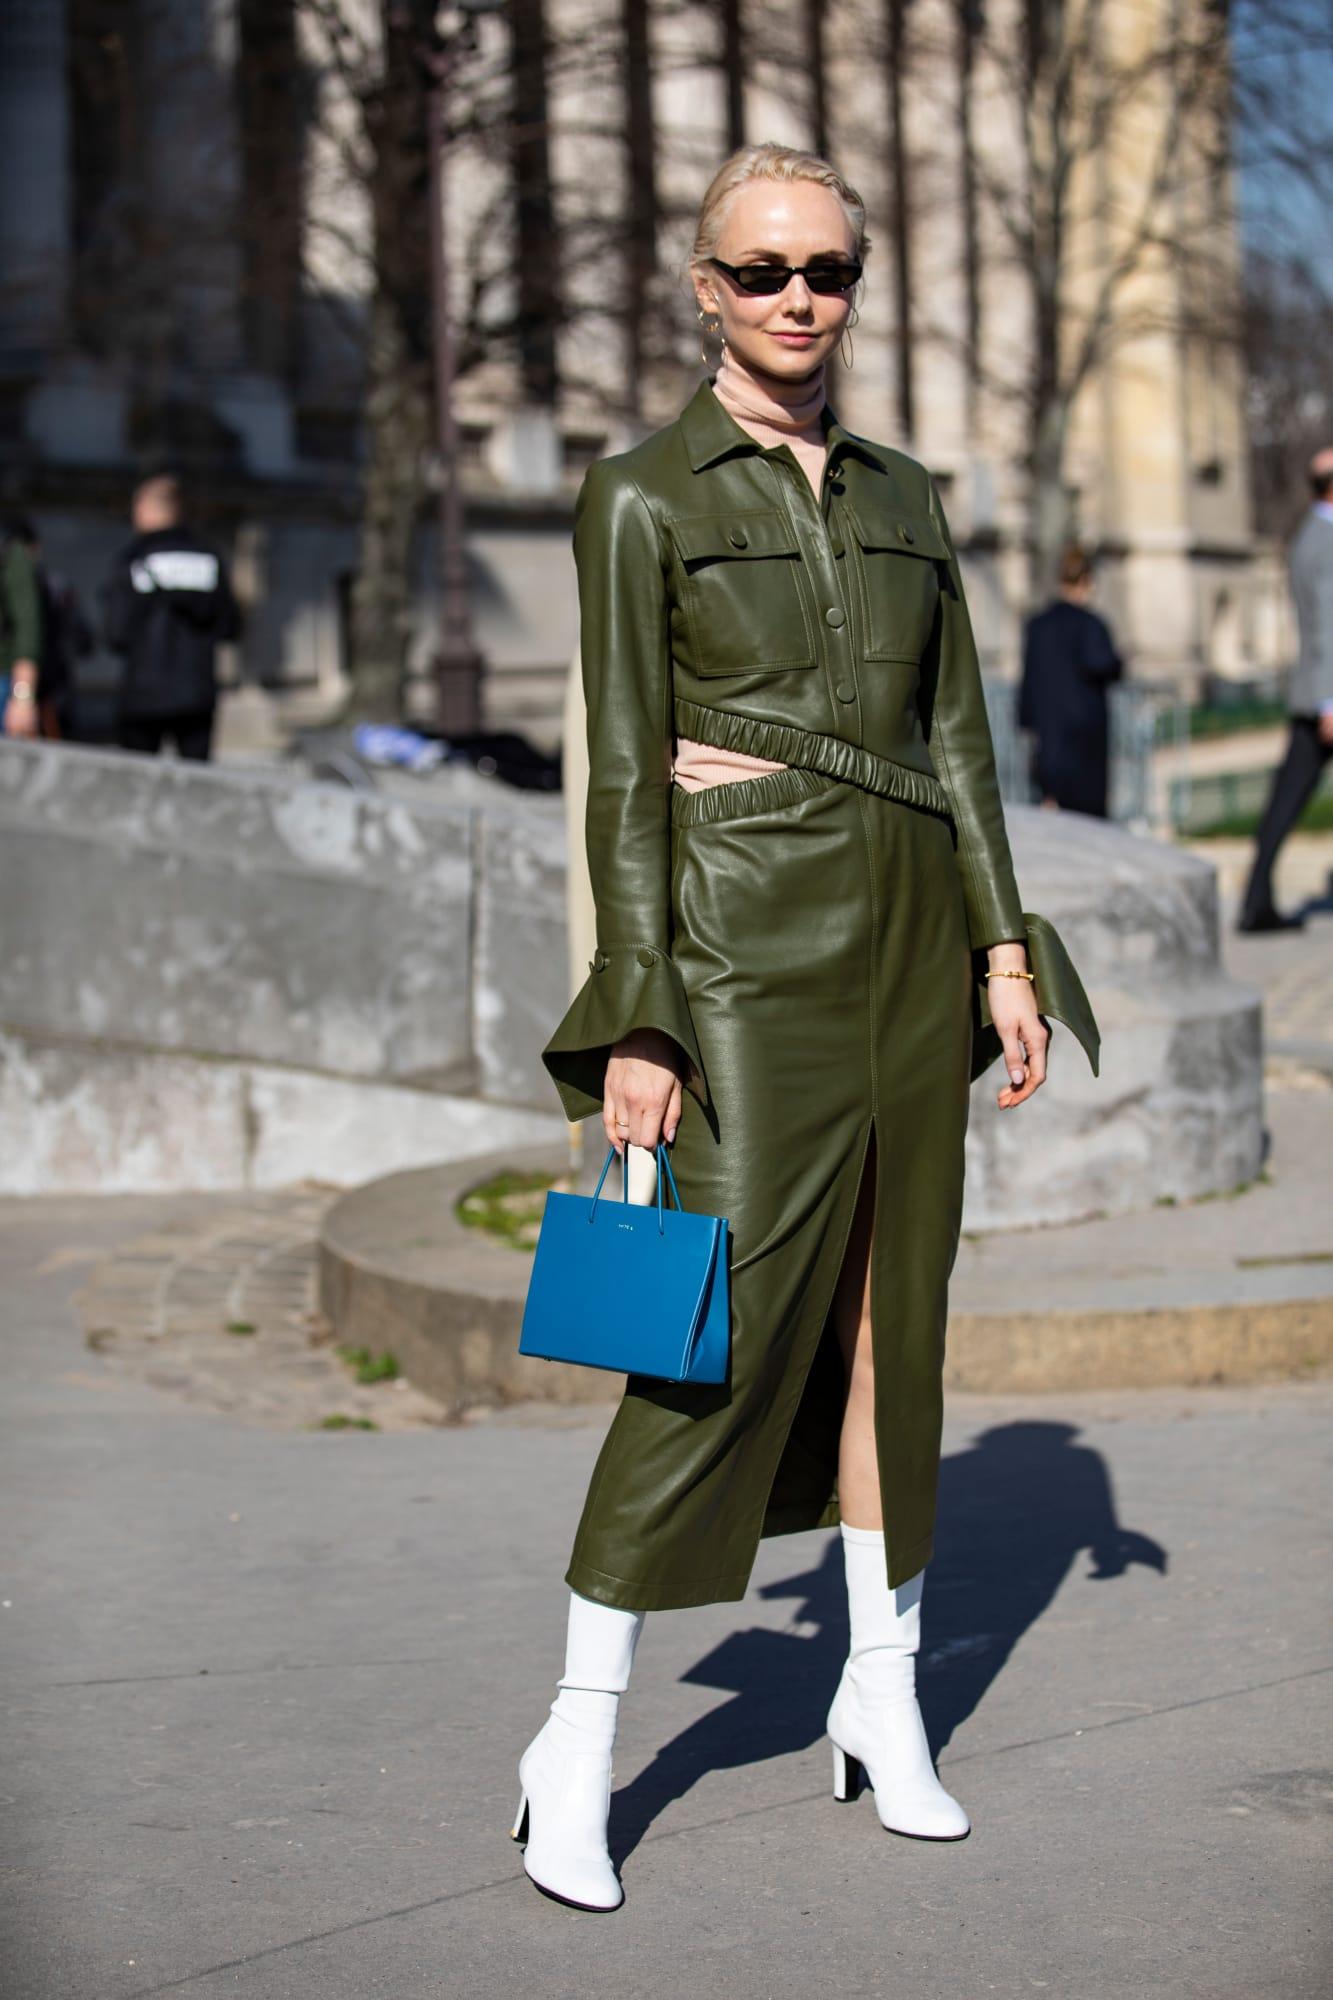 paris-fashion-week-fall-2019-street-style-day-2-12